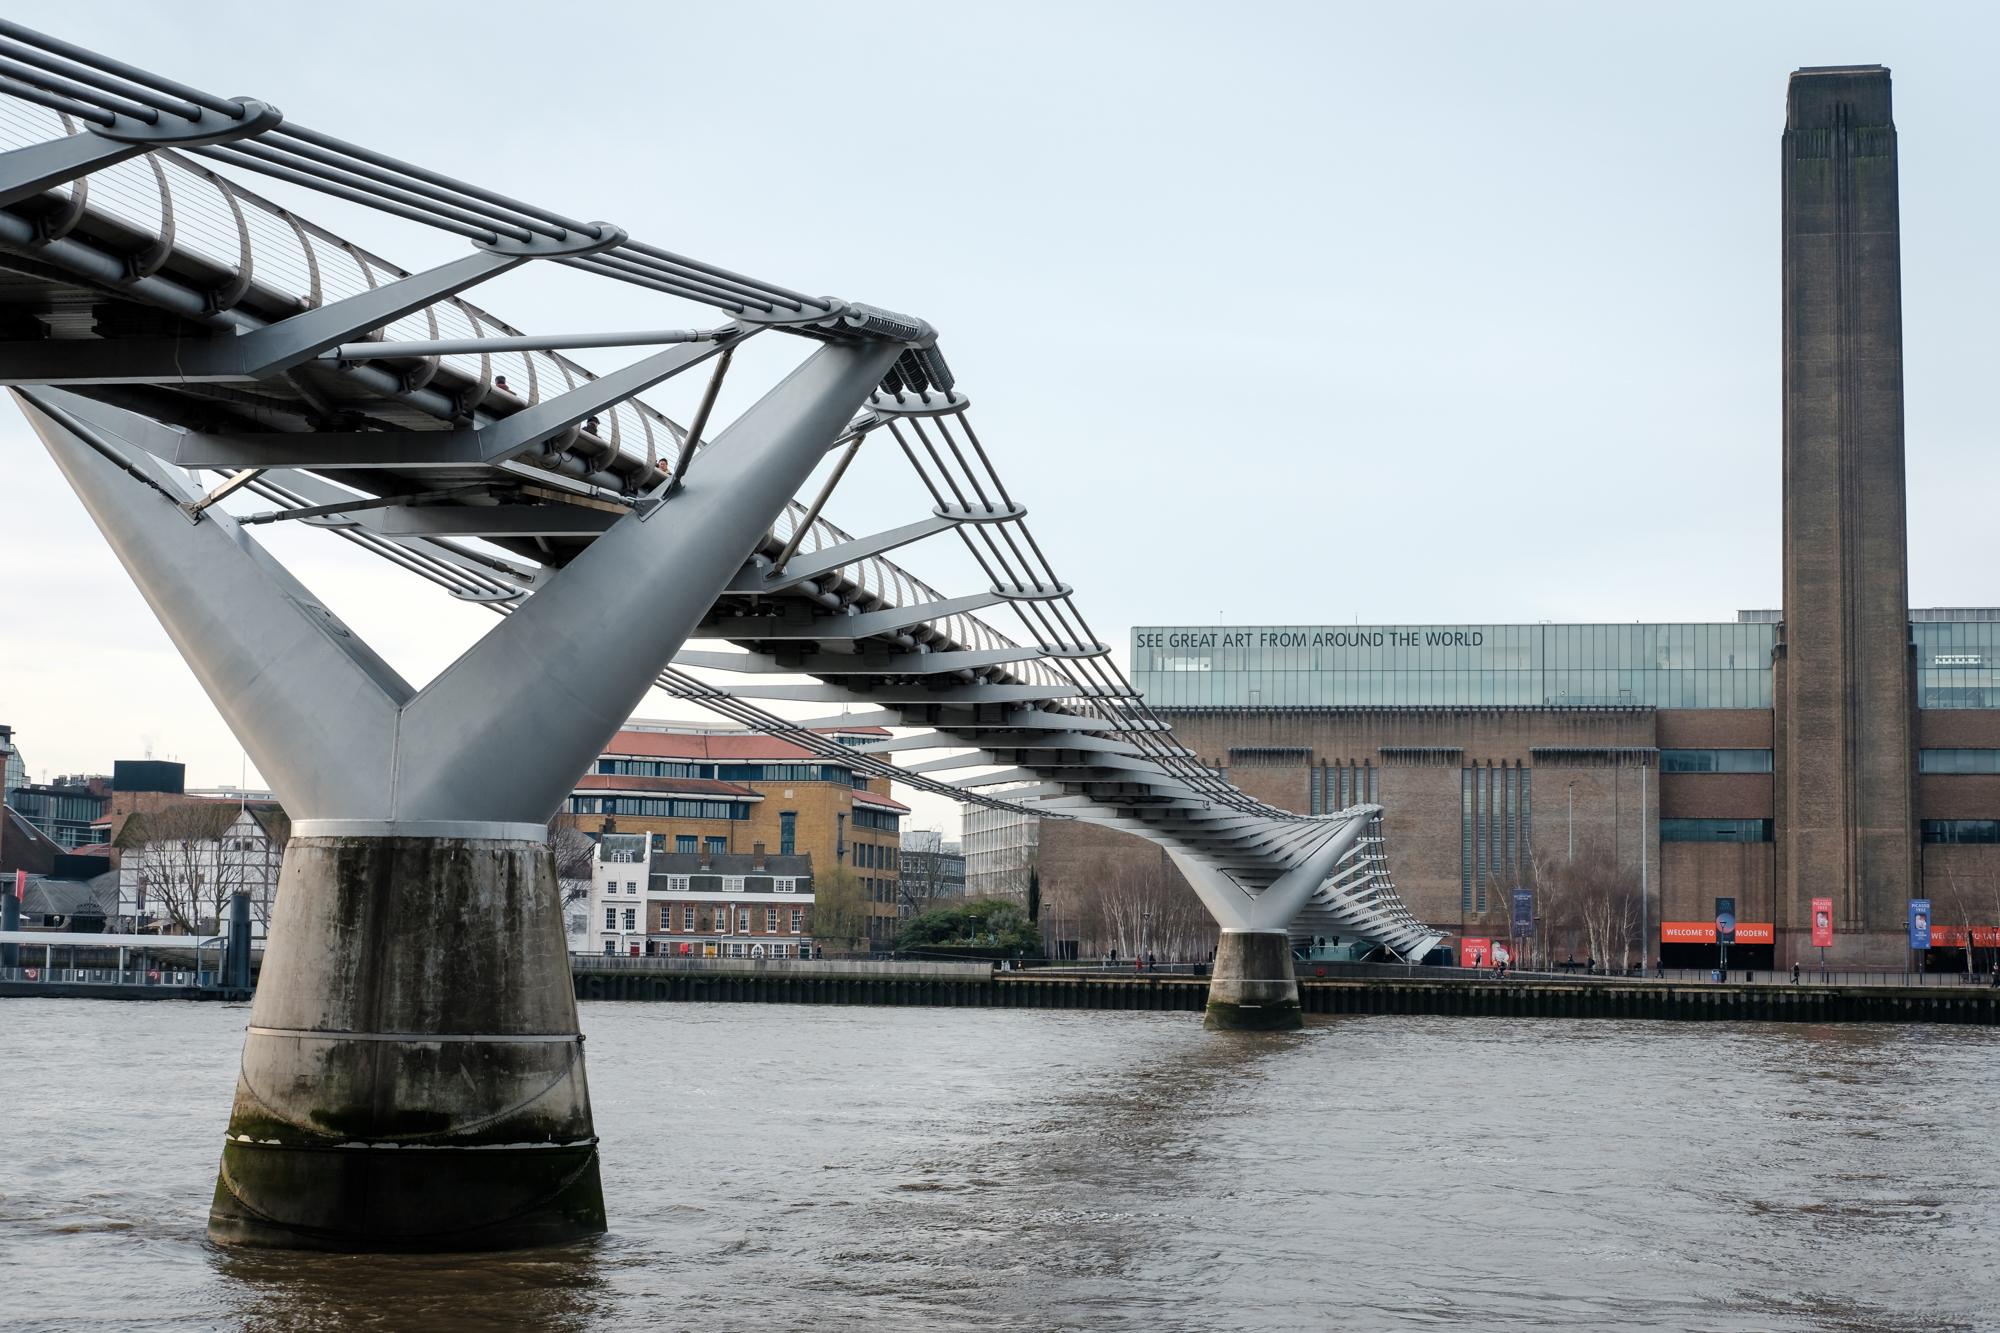 London Chrome photo of The Tate Modern by Trevor Sherwin